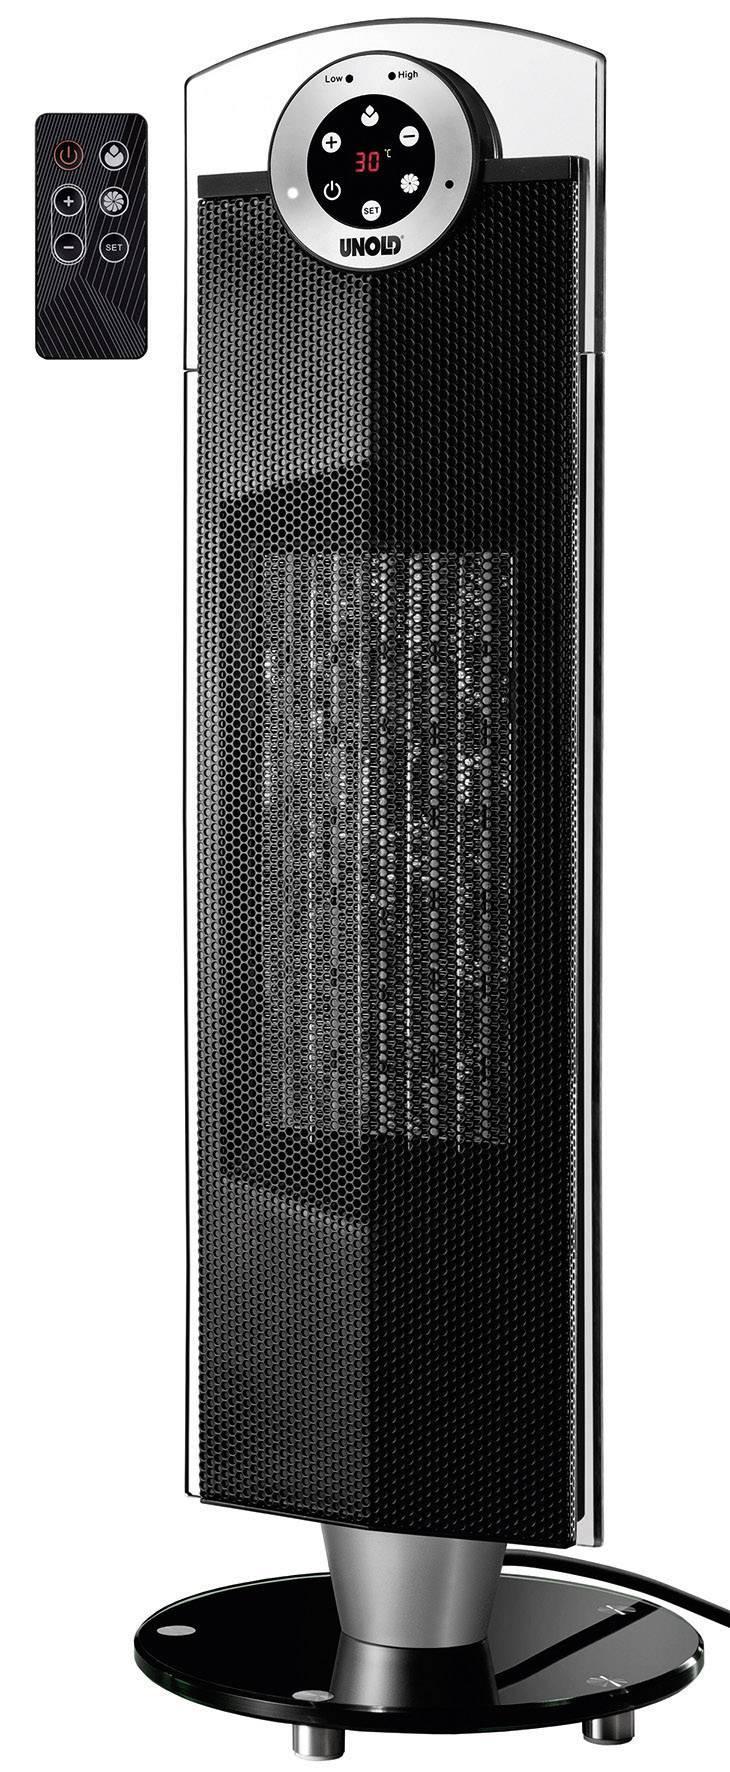 Unold 86525 Keramik-Heizl/üfter Tower electronic